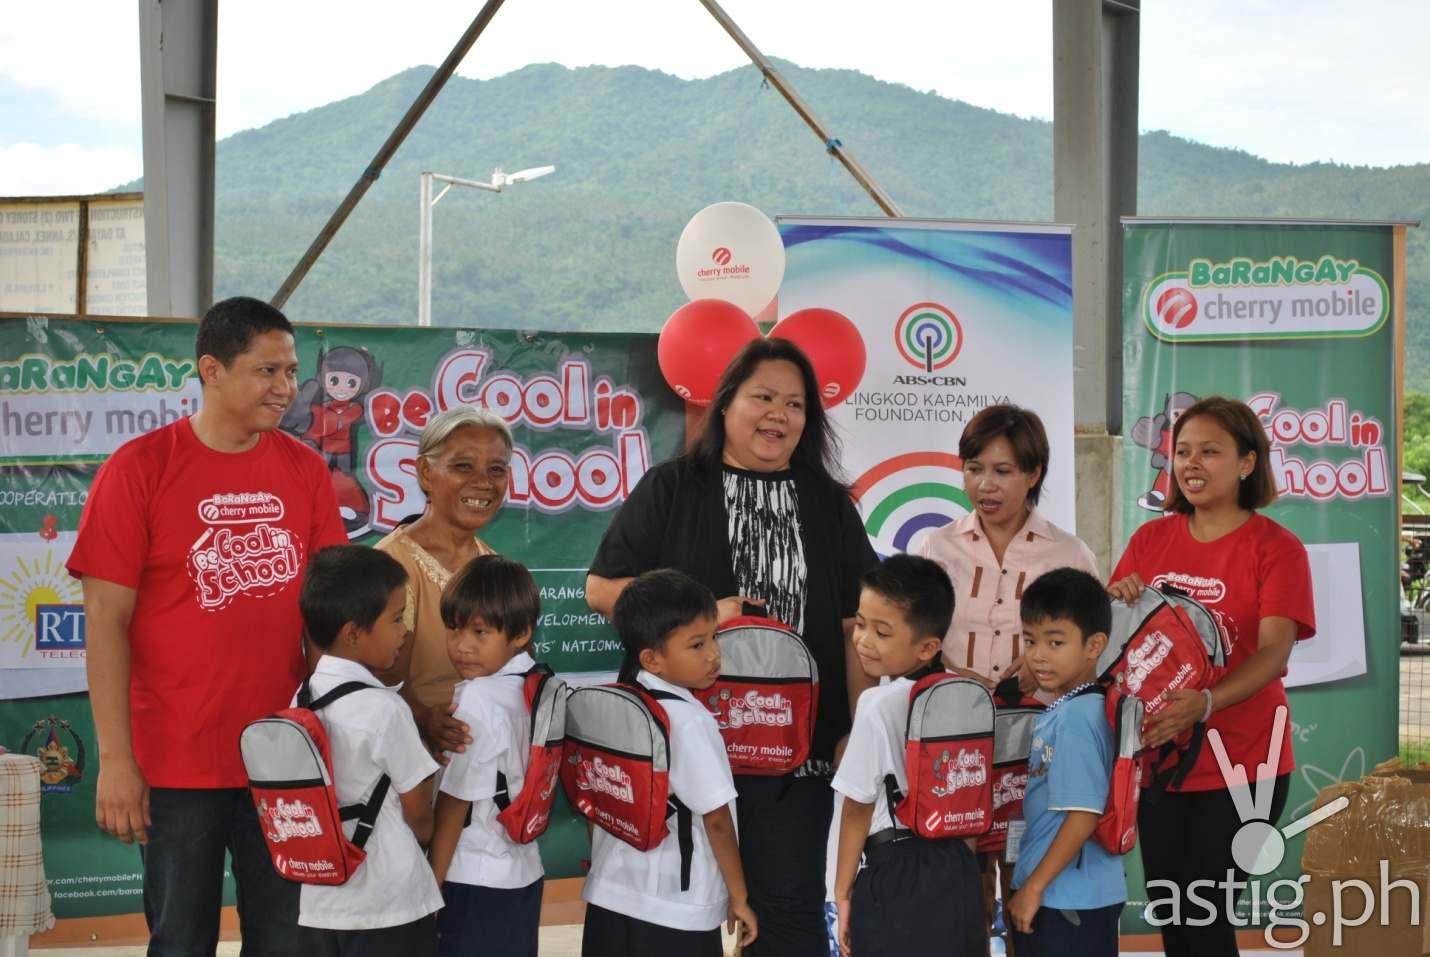 (L-R) Cherry Mobile's Laguna Distributor Ronald Rebong, a parent representative from BayaniJuan, Programa Genio's Representative Cherry Villafuerte, DESA